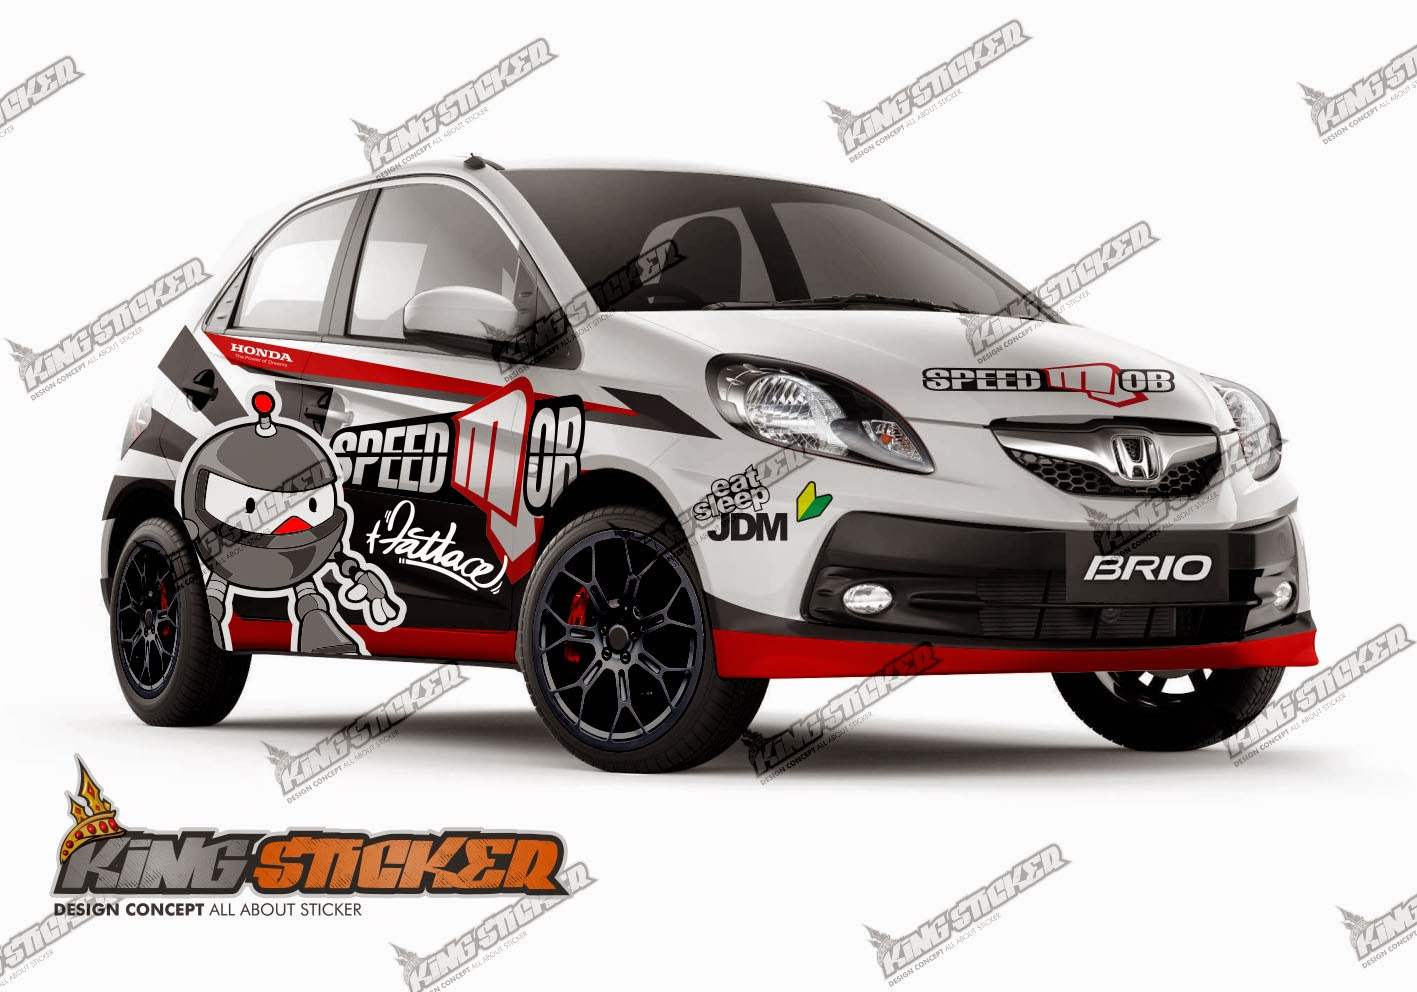 Variasi Stiker Honda Brio  wwwbilderbestecom